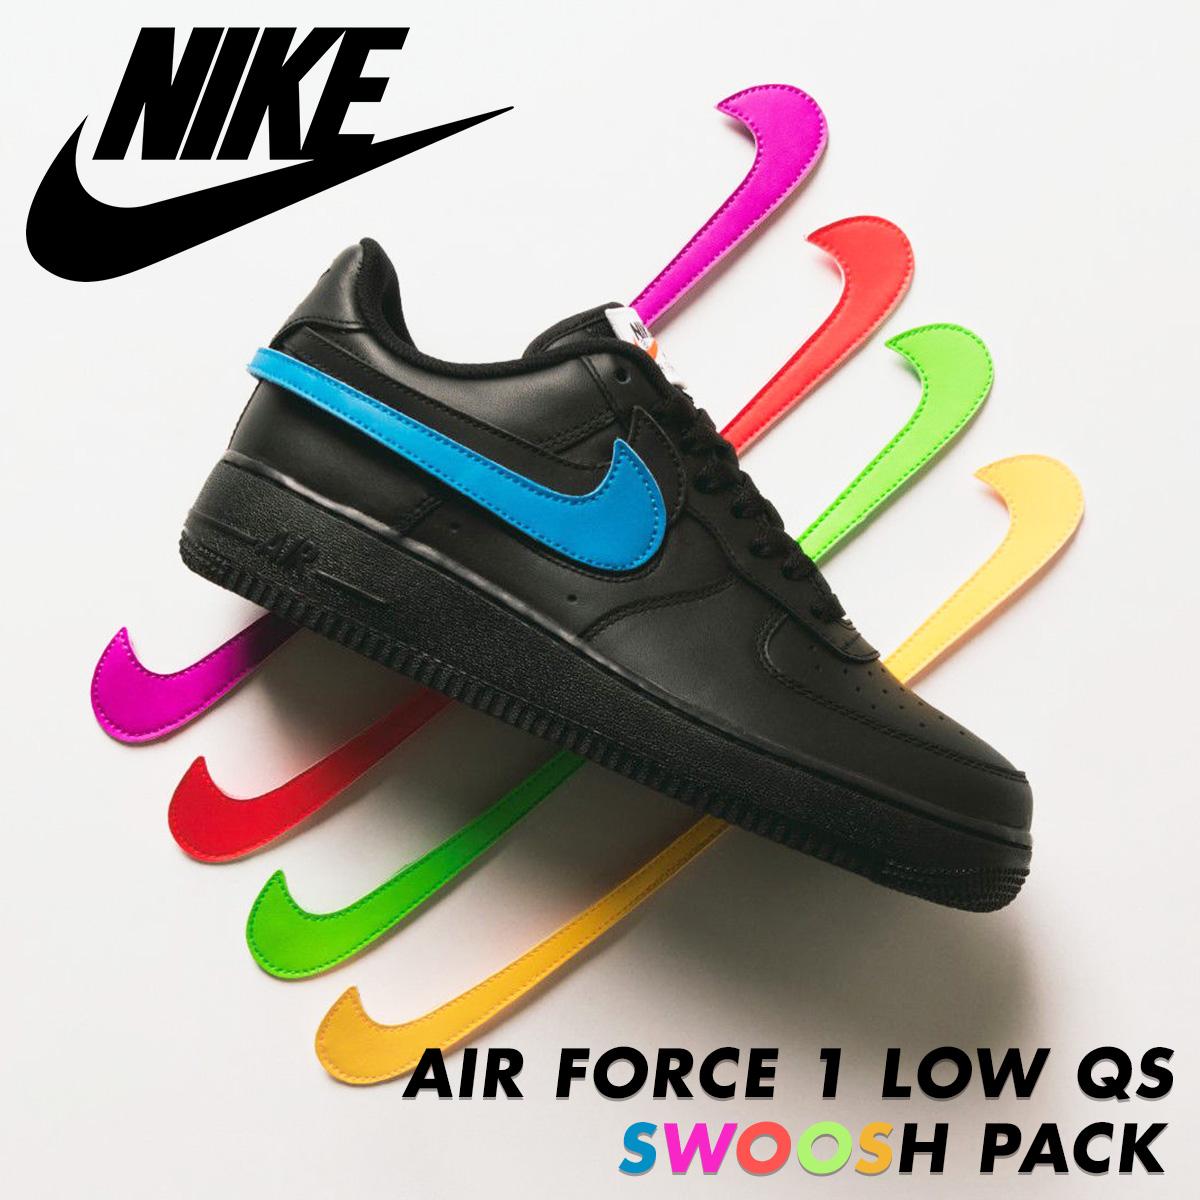 nike air force 1 swoosh pack indonesia